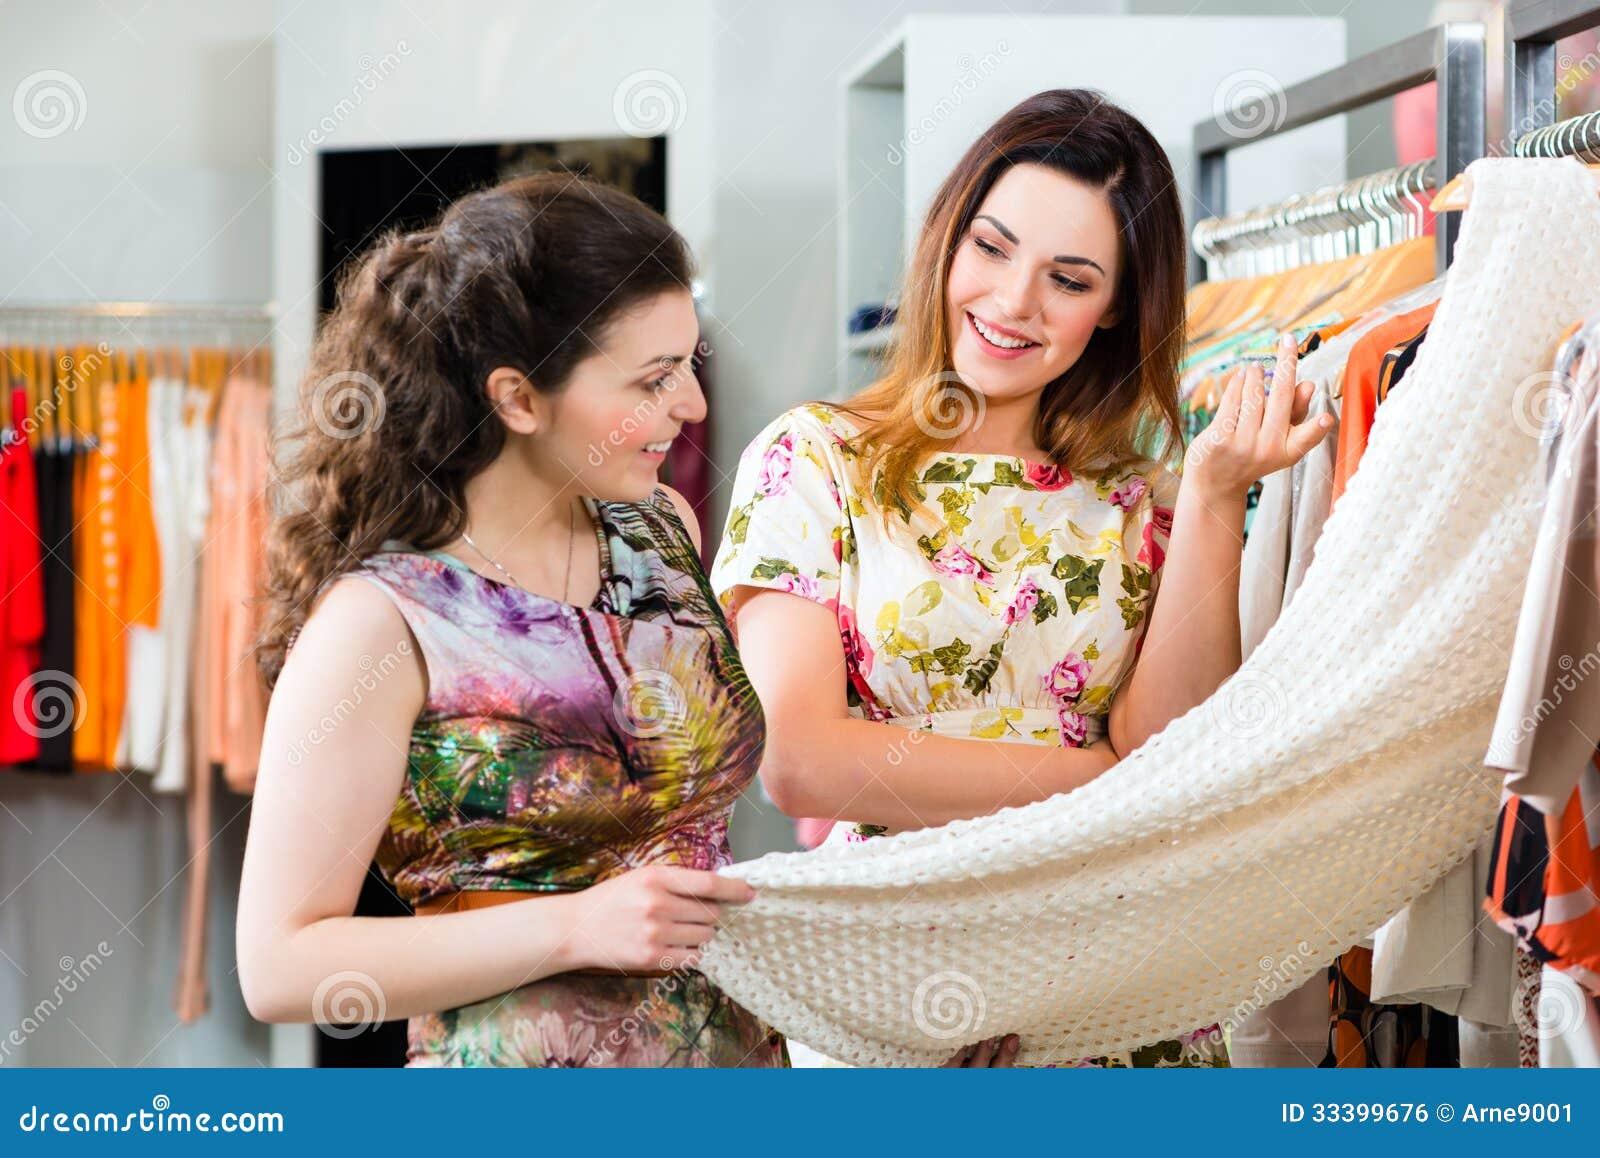 Narrative Essay on Whether You Enjoy Shopping